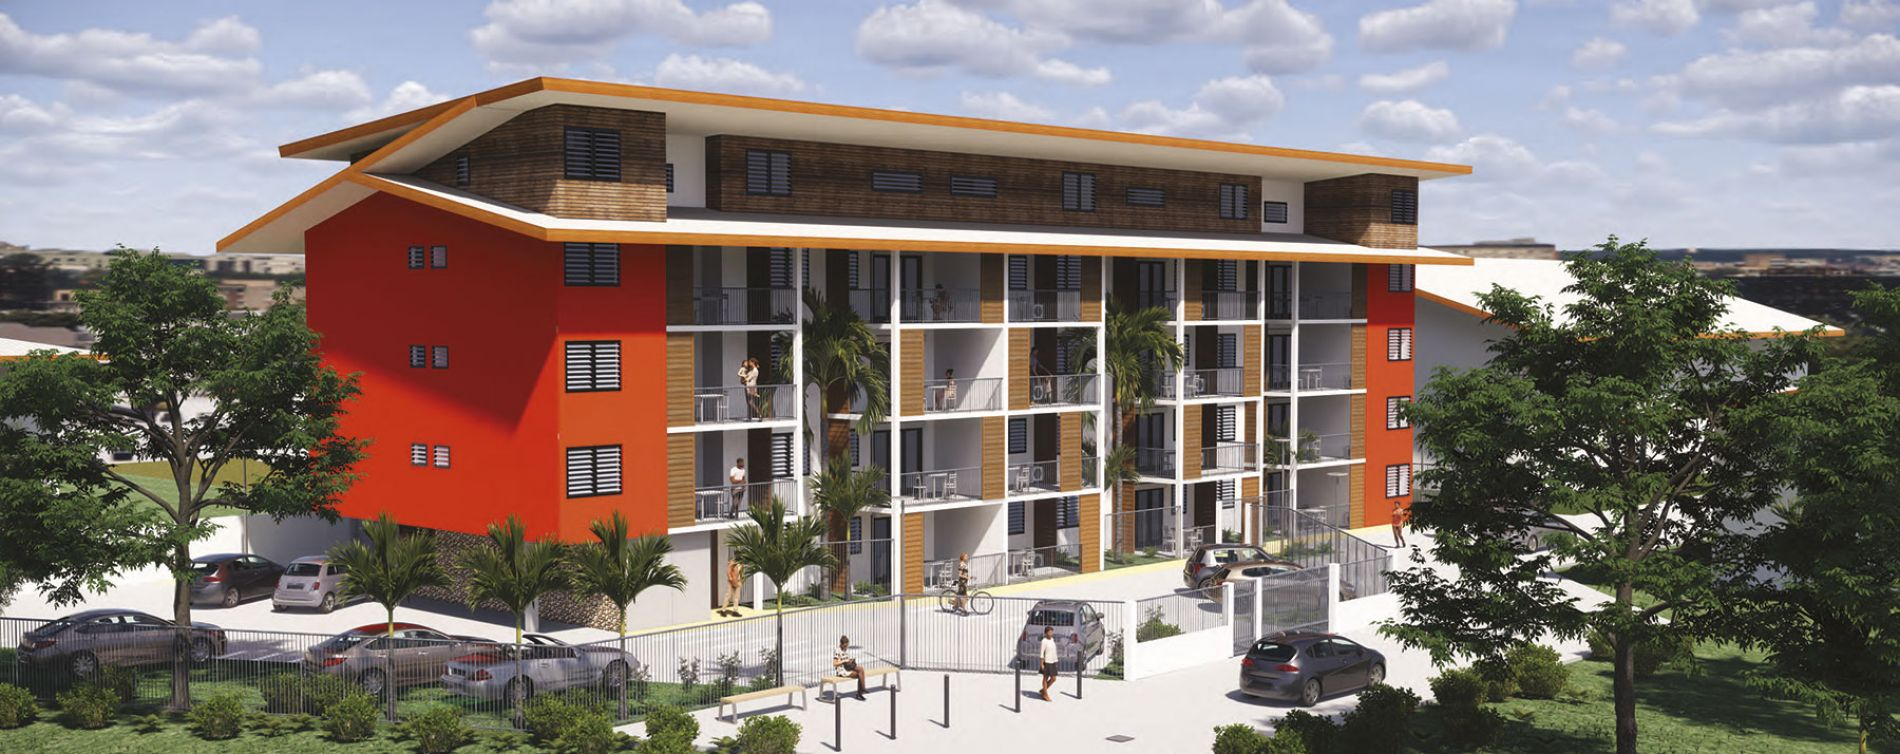 Cayenne : programme immobilier neuve « Les Amaryllis » (3)